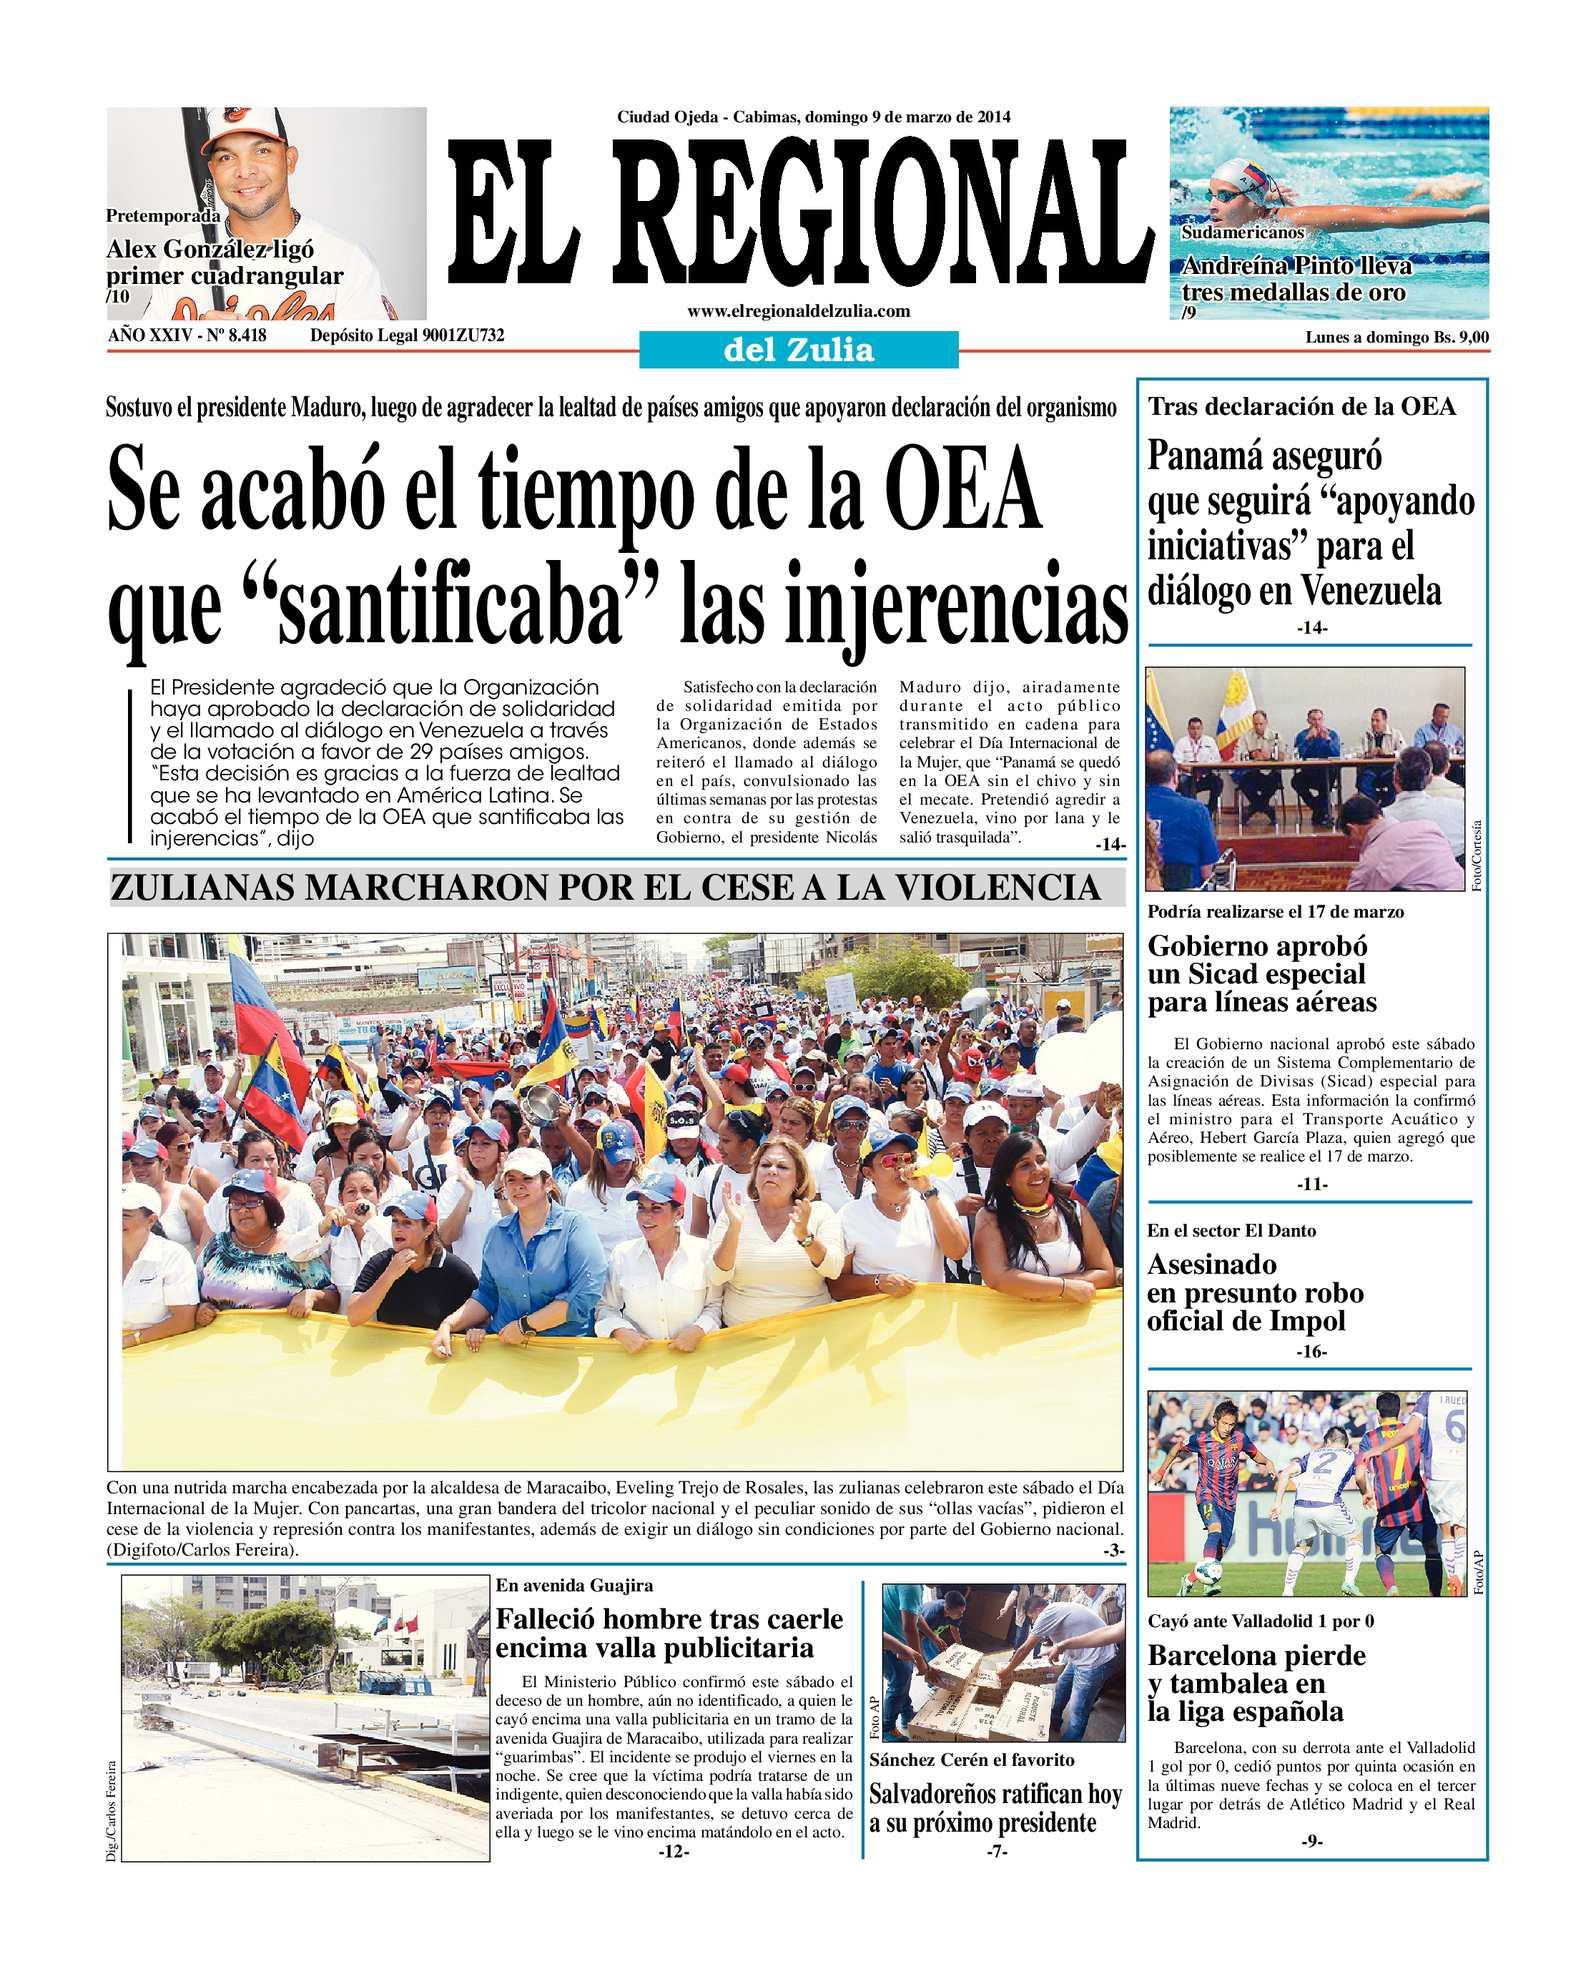 Calaméo - El Regional del Zulia 09-03-2014